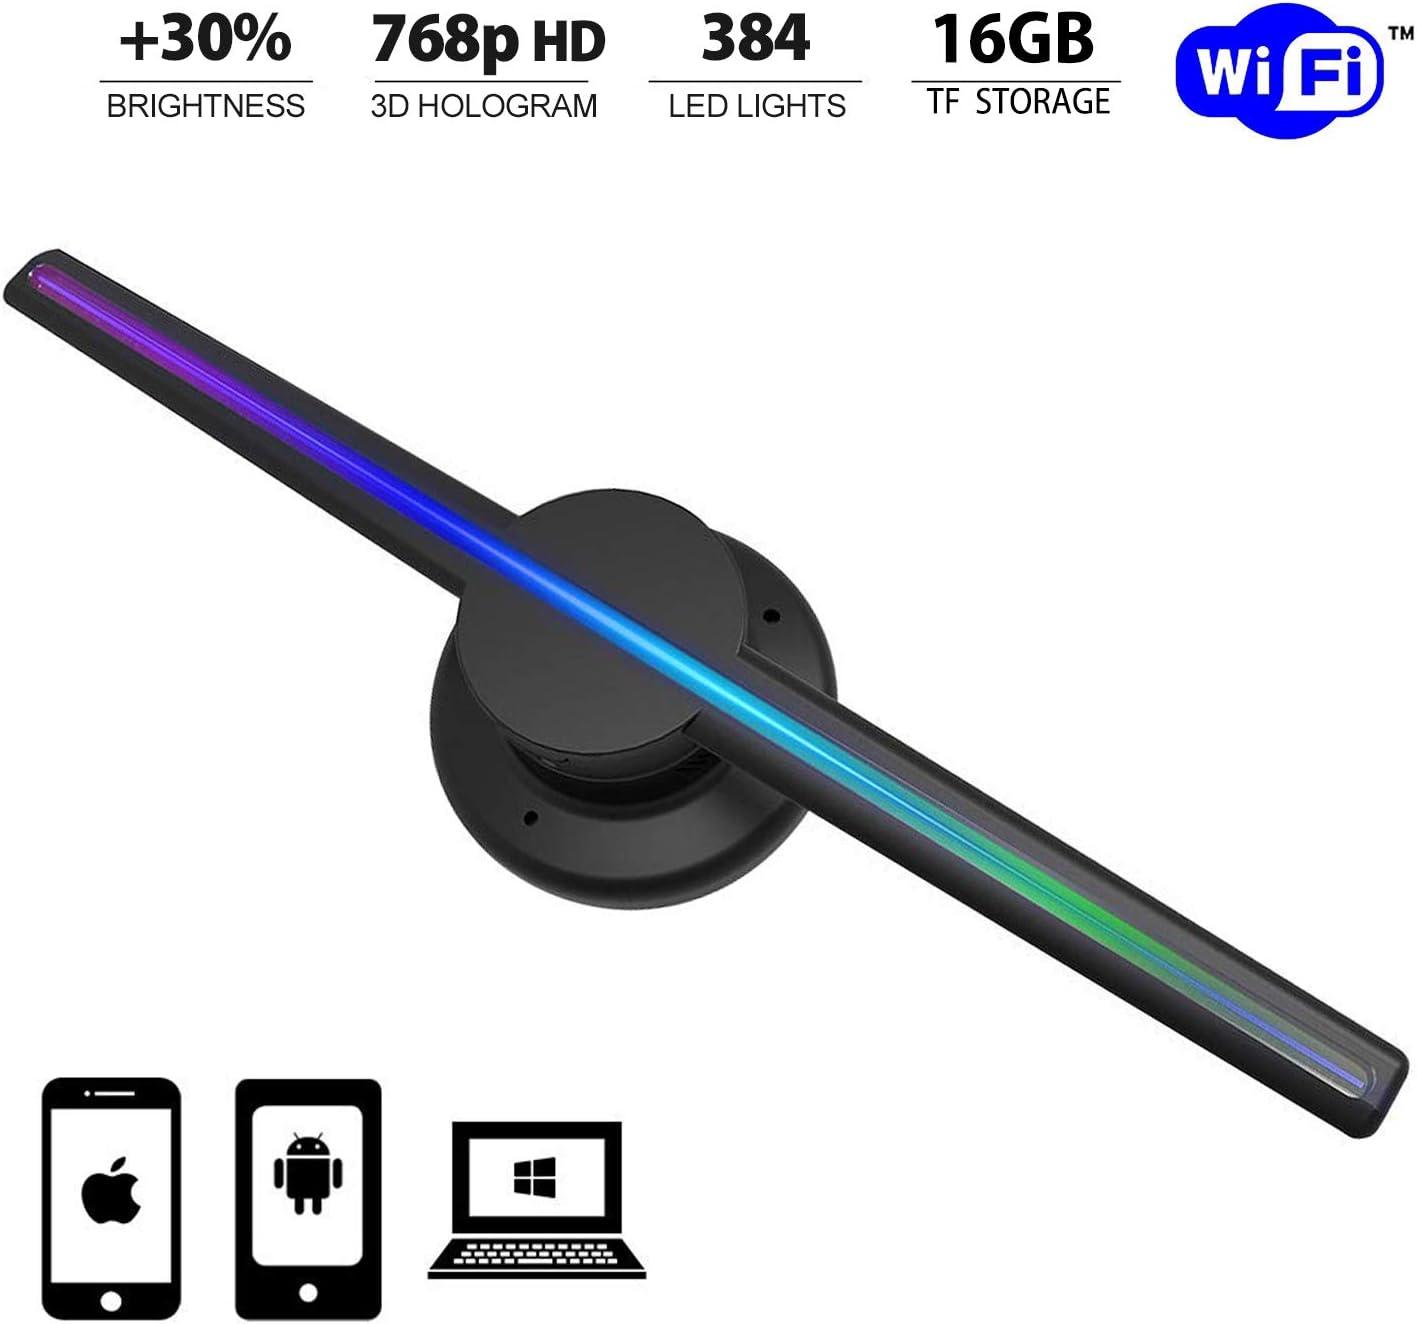 geeka-3D WiFi Holographic Projector Display Fan Hologram